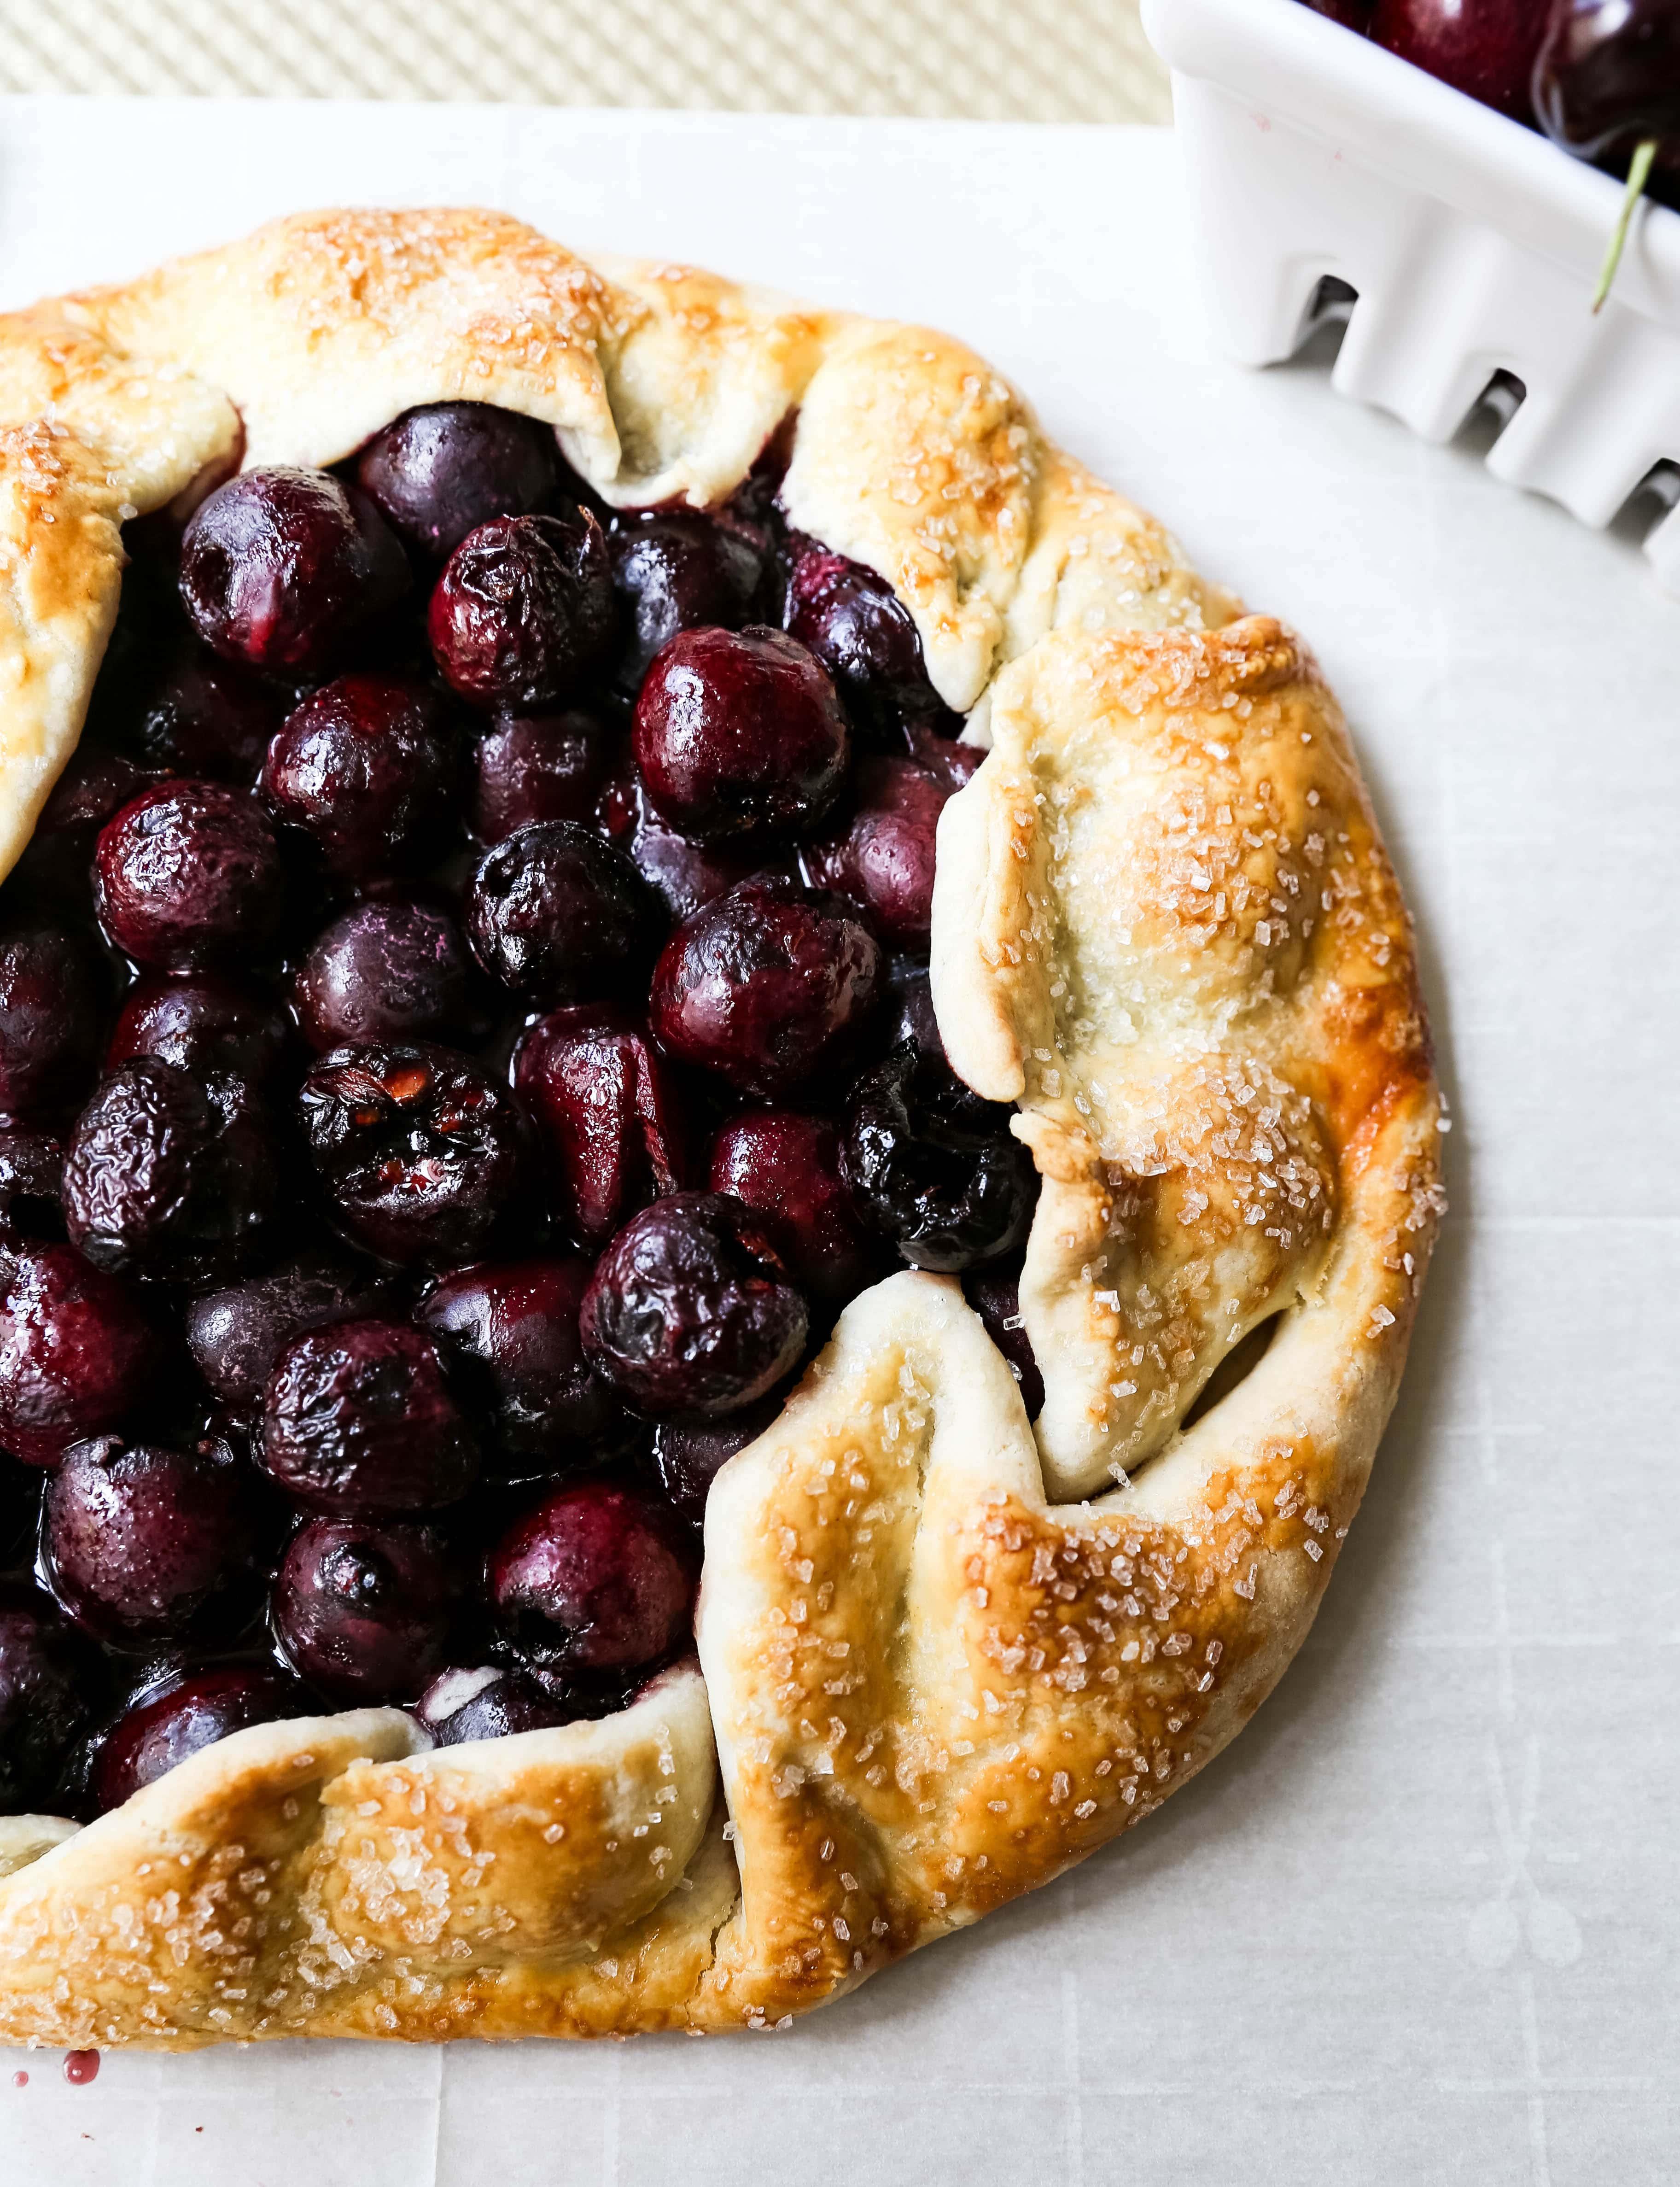 Cherry Galette. Fresh sweet cherries baked in a homemade rustic pie crust and topped with vanilla bean ice cream. The Best Cherry Crostata Recipe. www.modernhoney.com #cherrygalette #cherrycrostata #cherries #cherry #cherrydessert